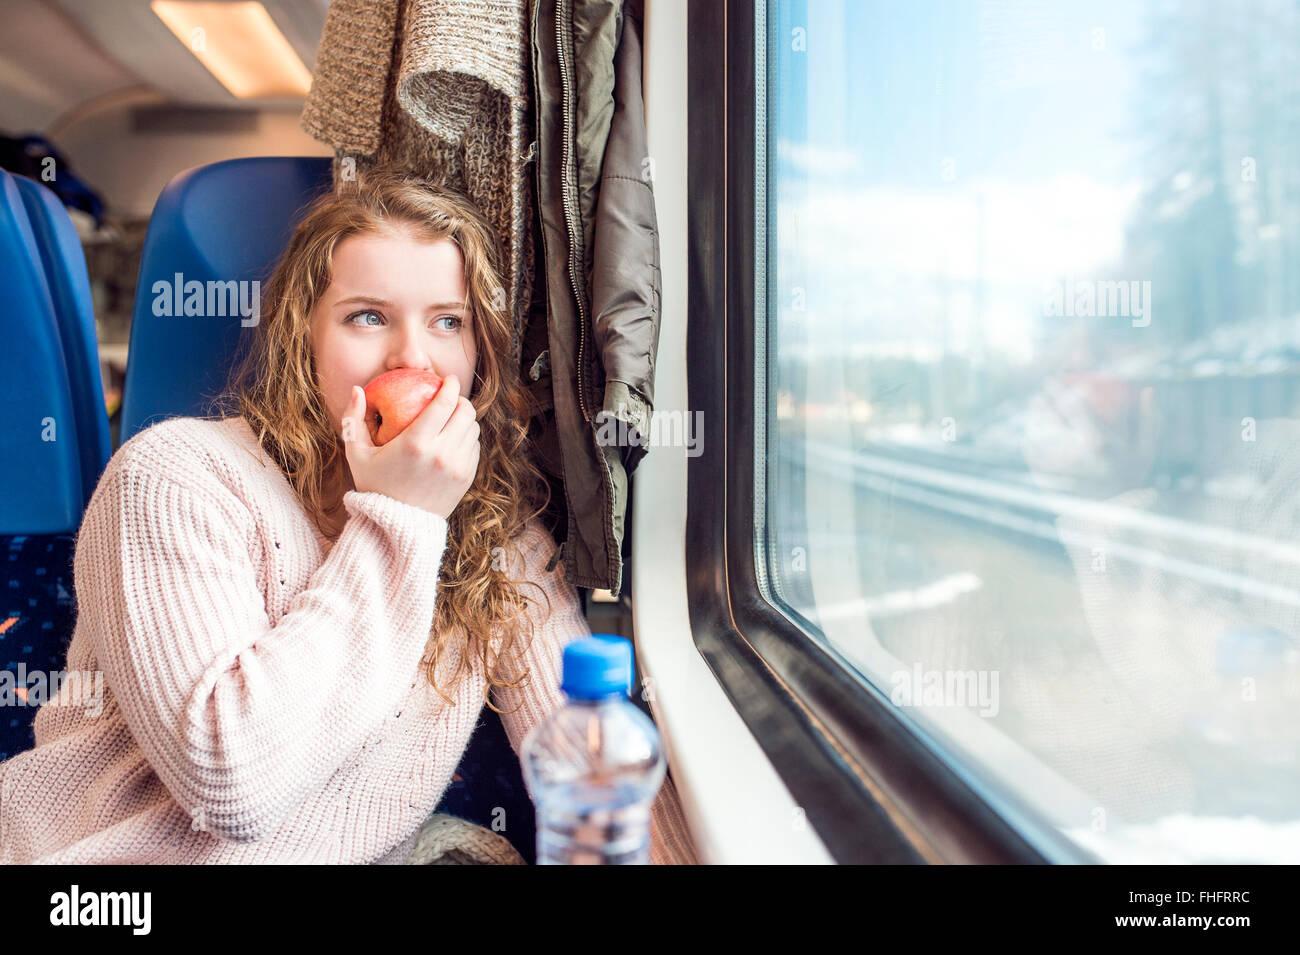 Teenage girl in train car eating an apple - Stock Image